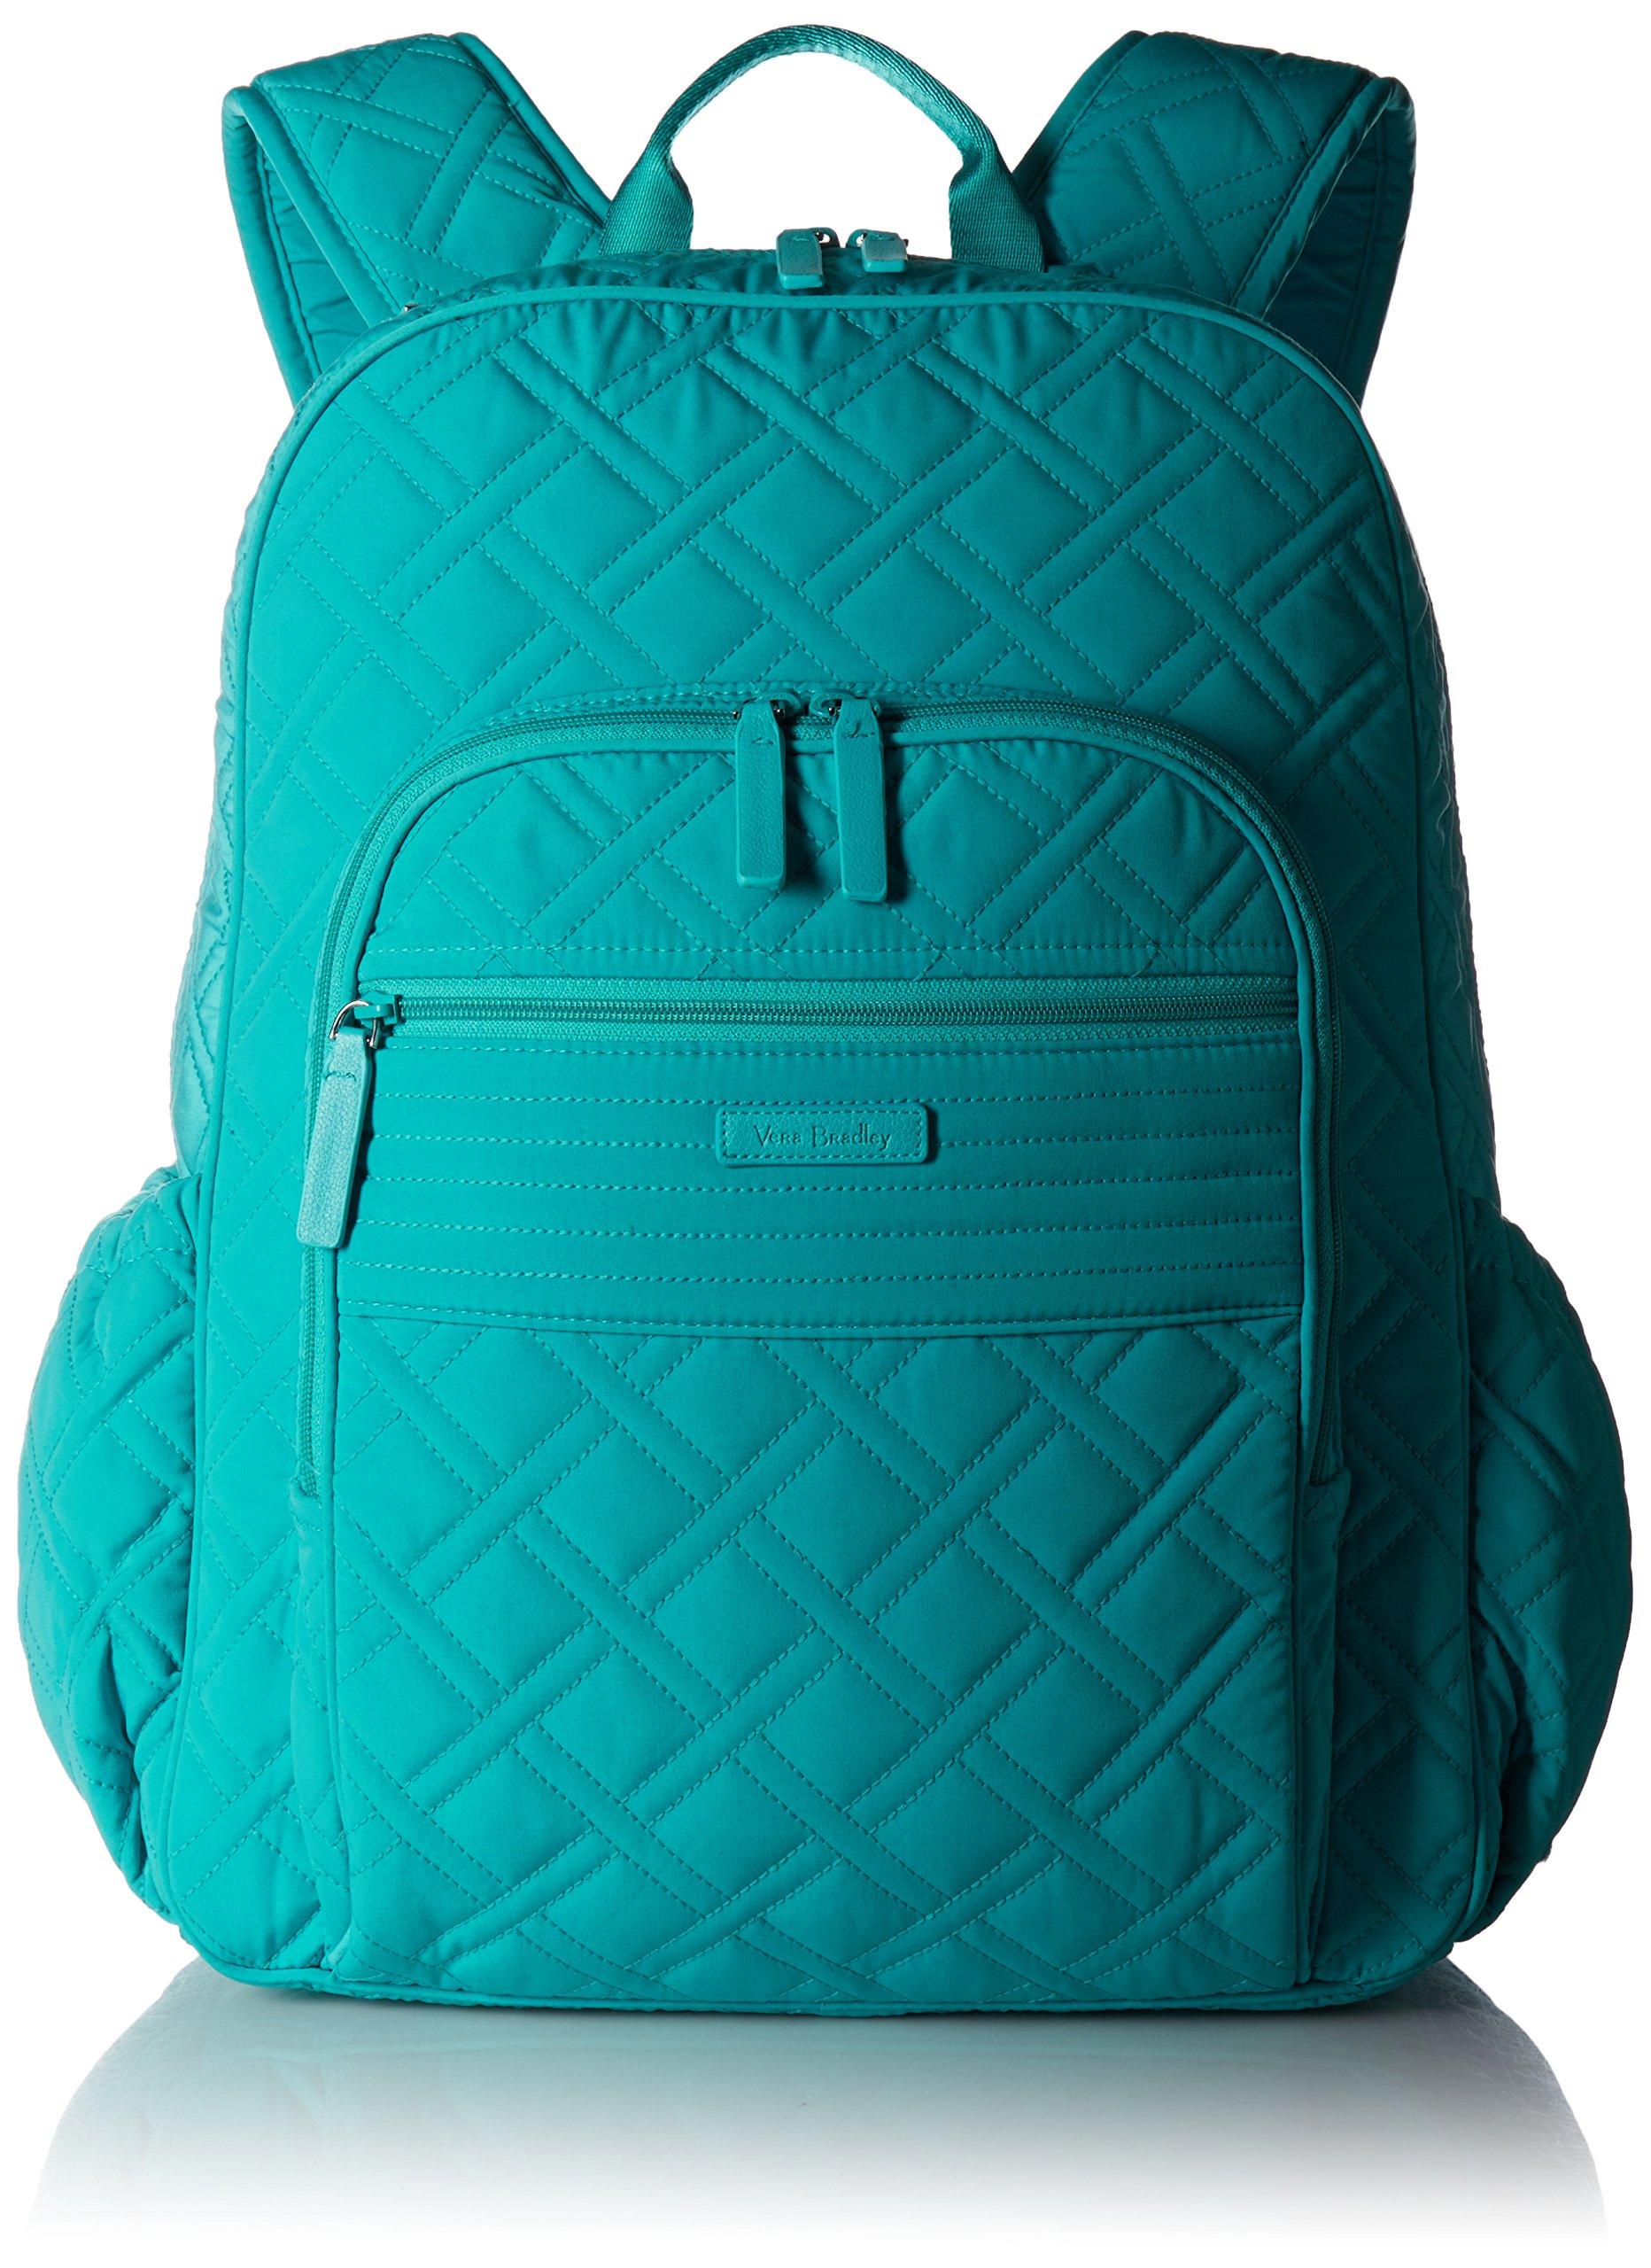 Vera Bradley Women's Backpack, Turquoise Sea